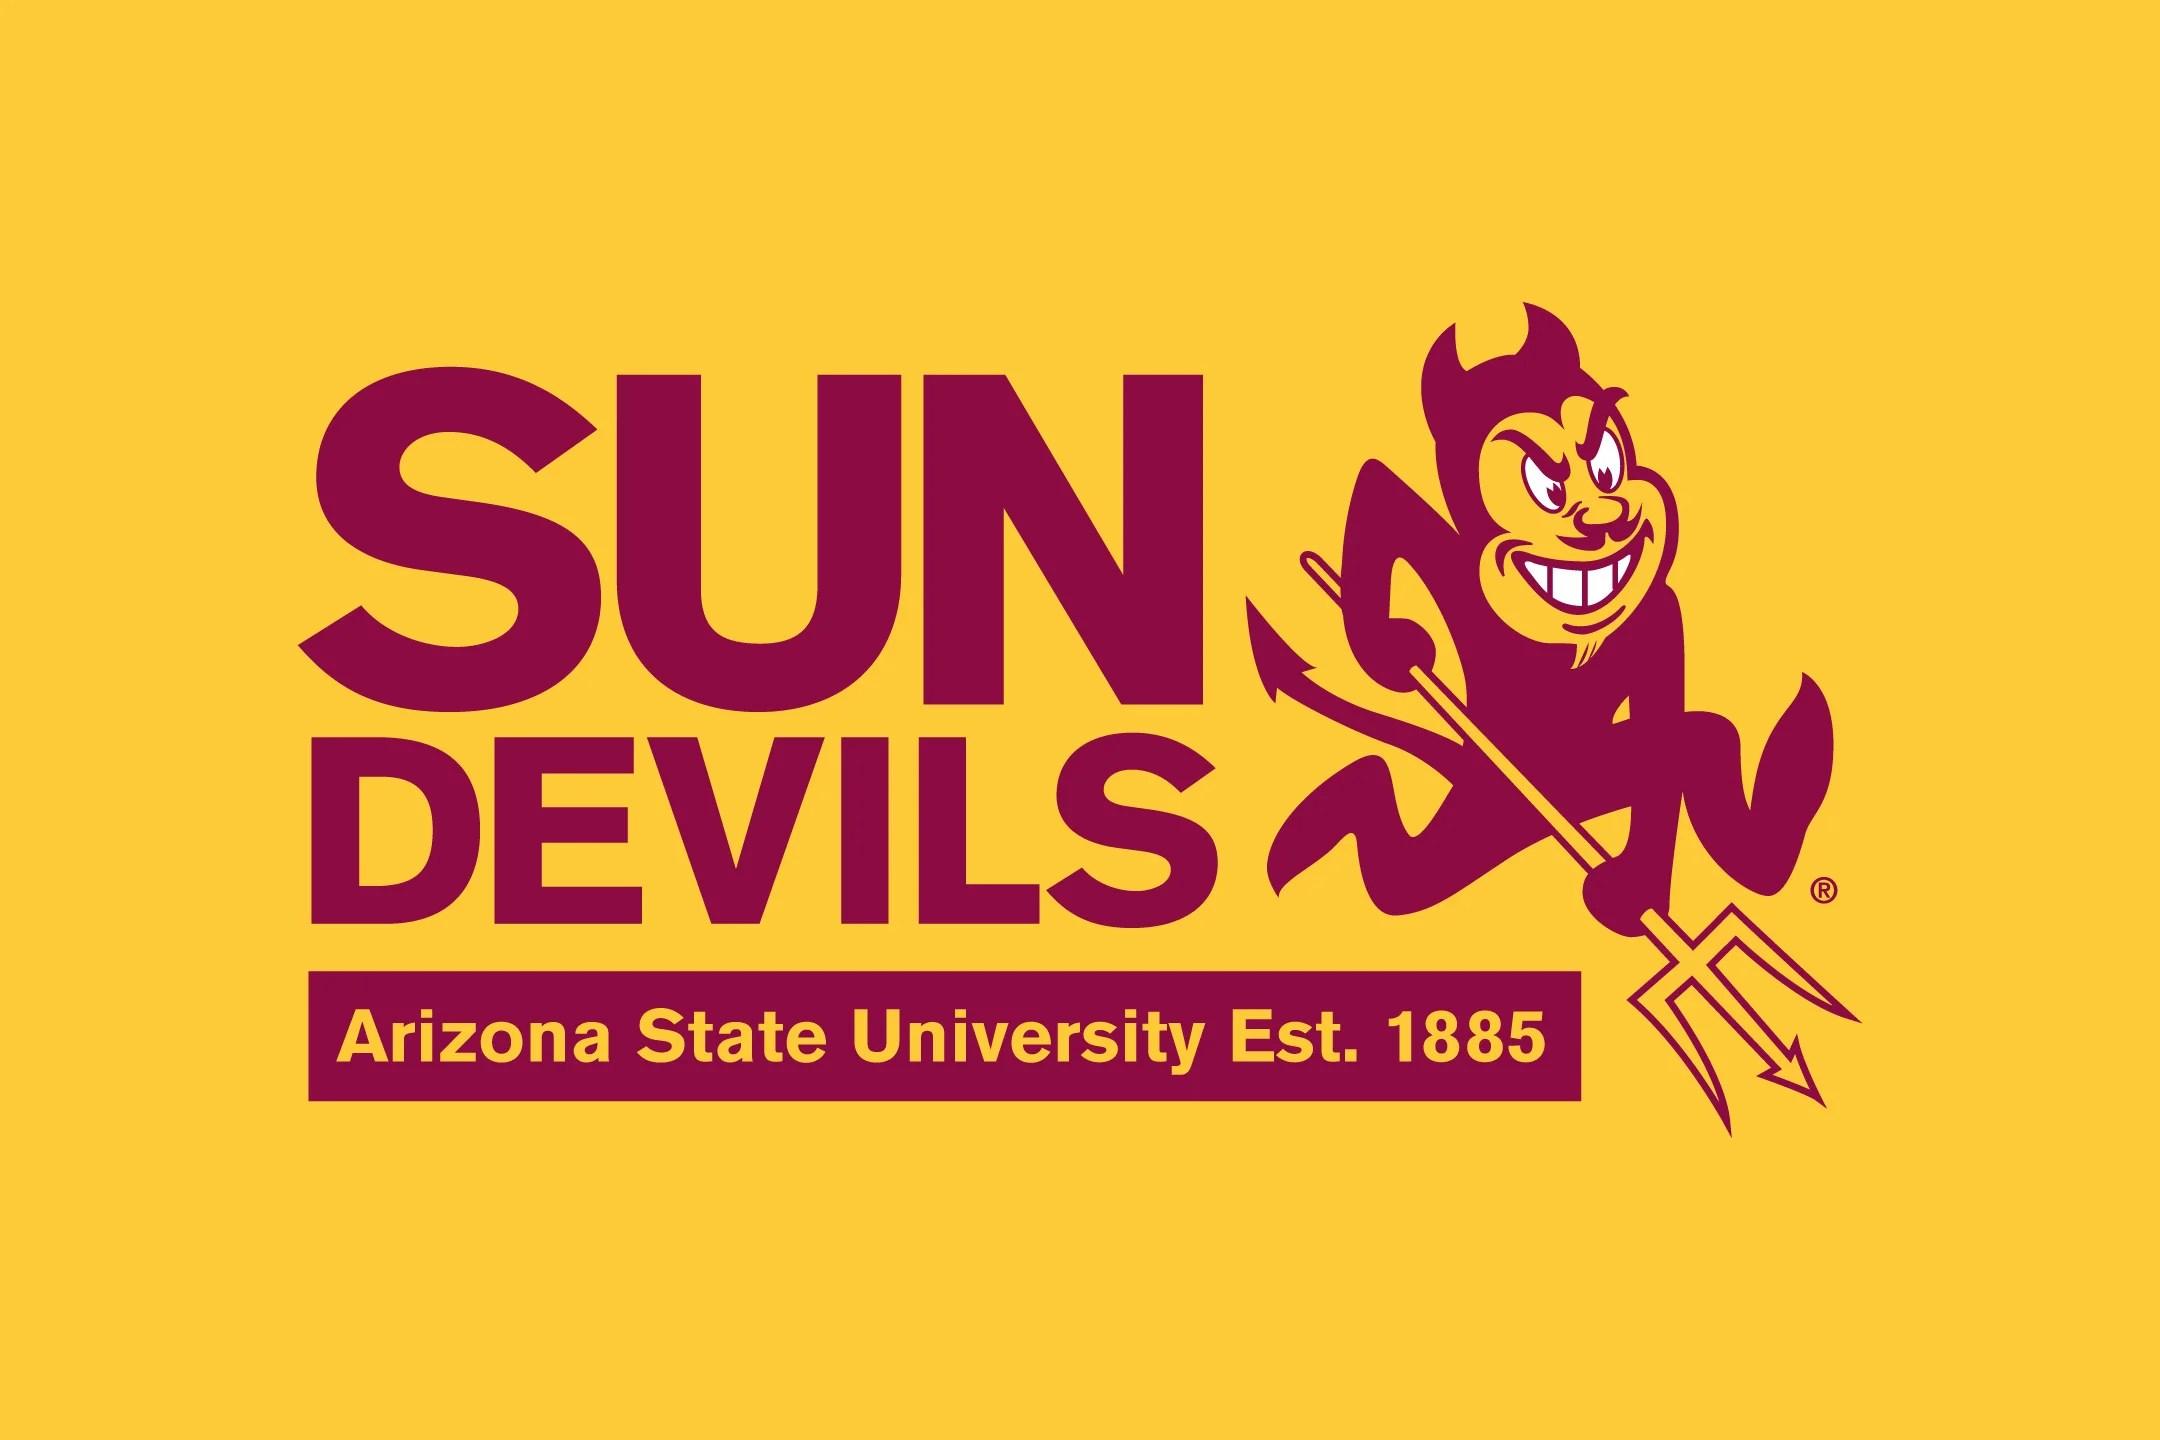 ASU Welcome Social Media Covers  Arizona State University